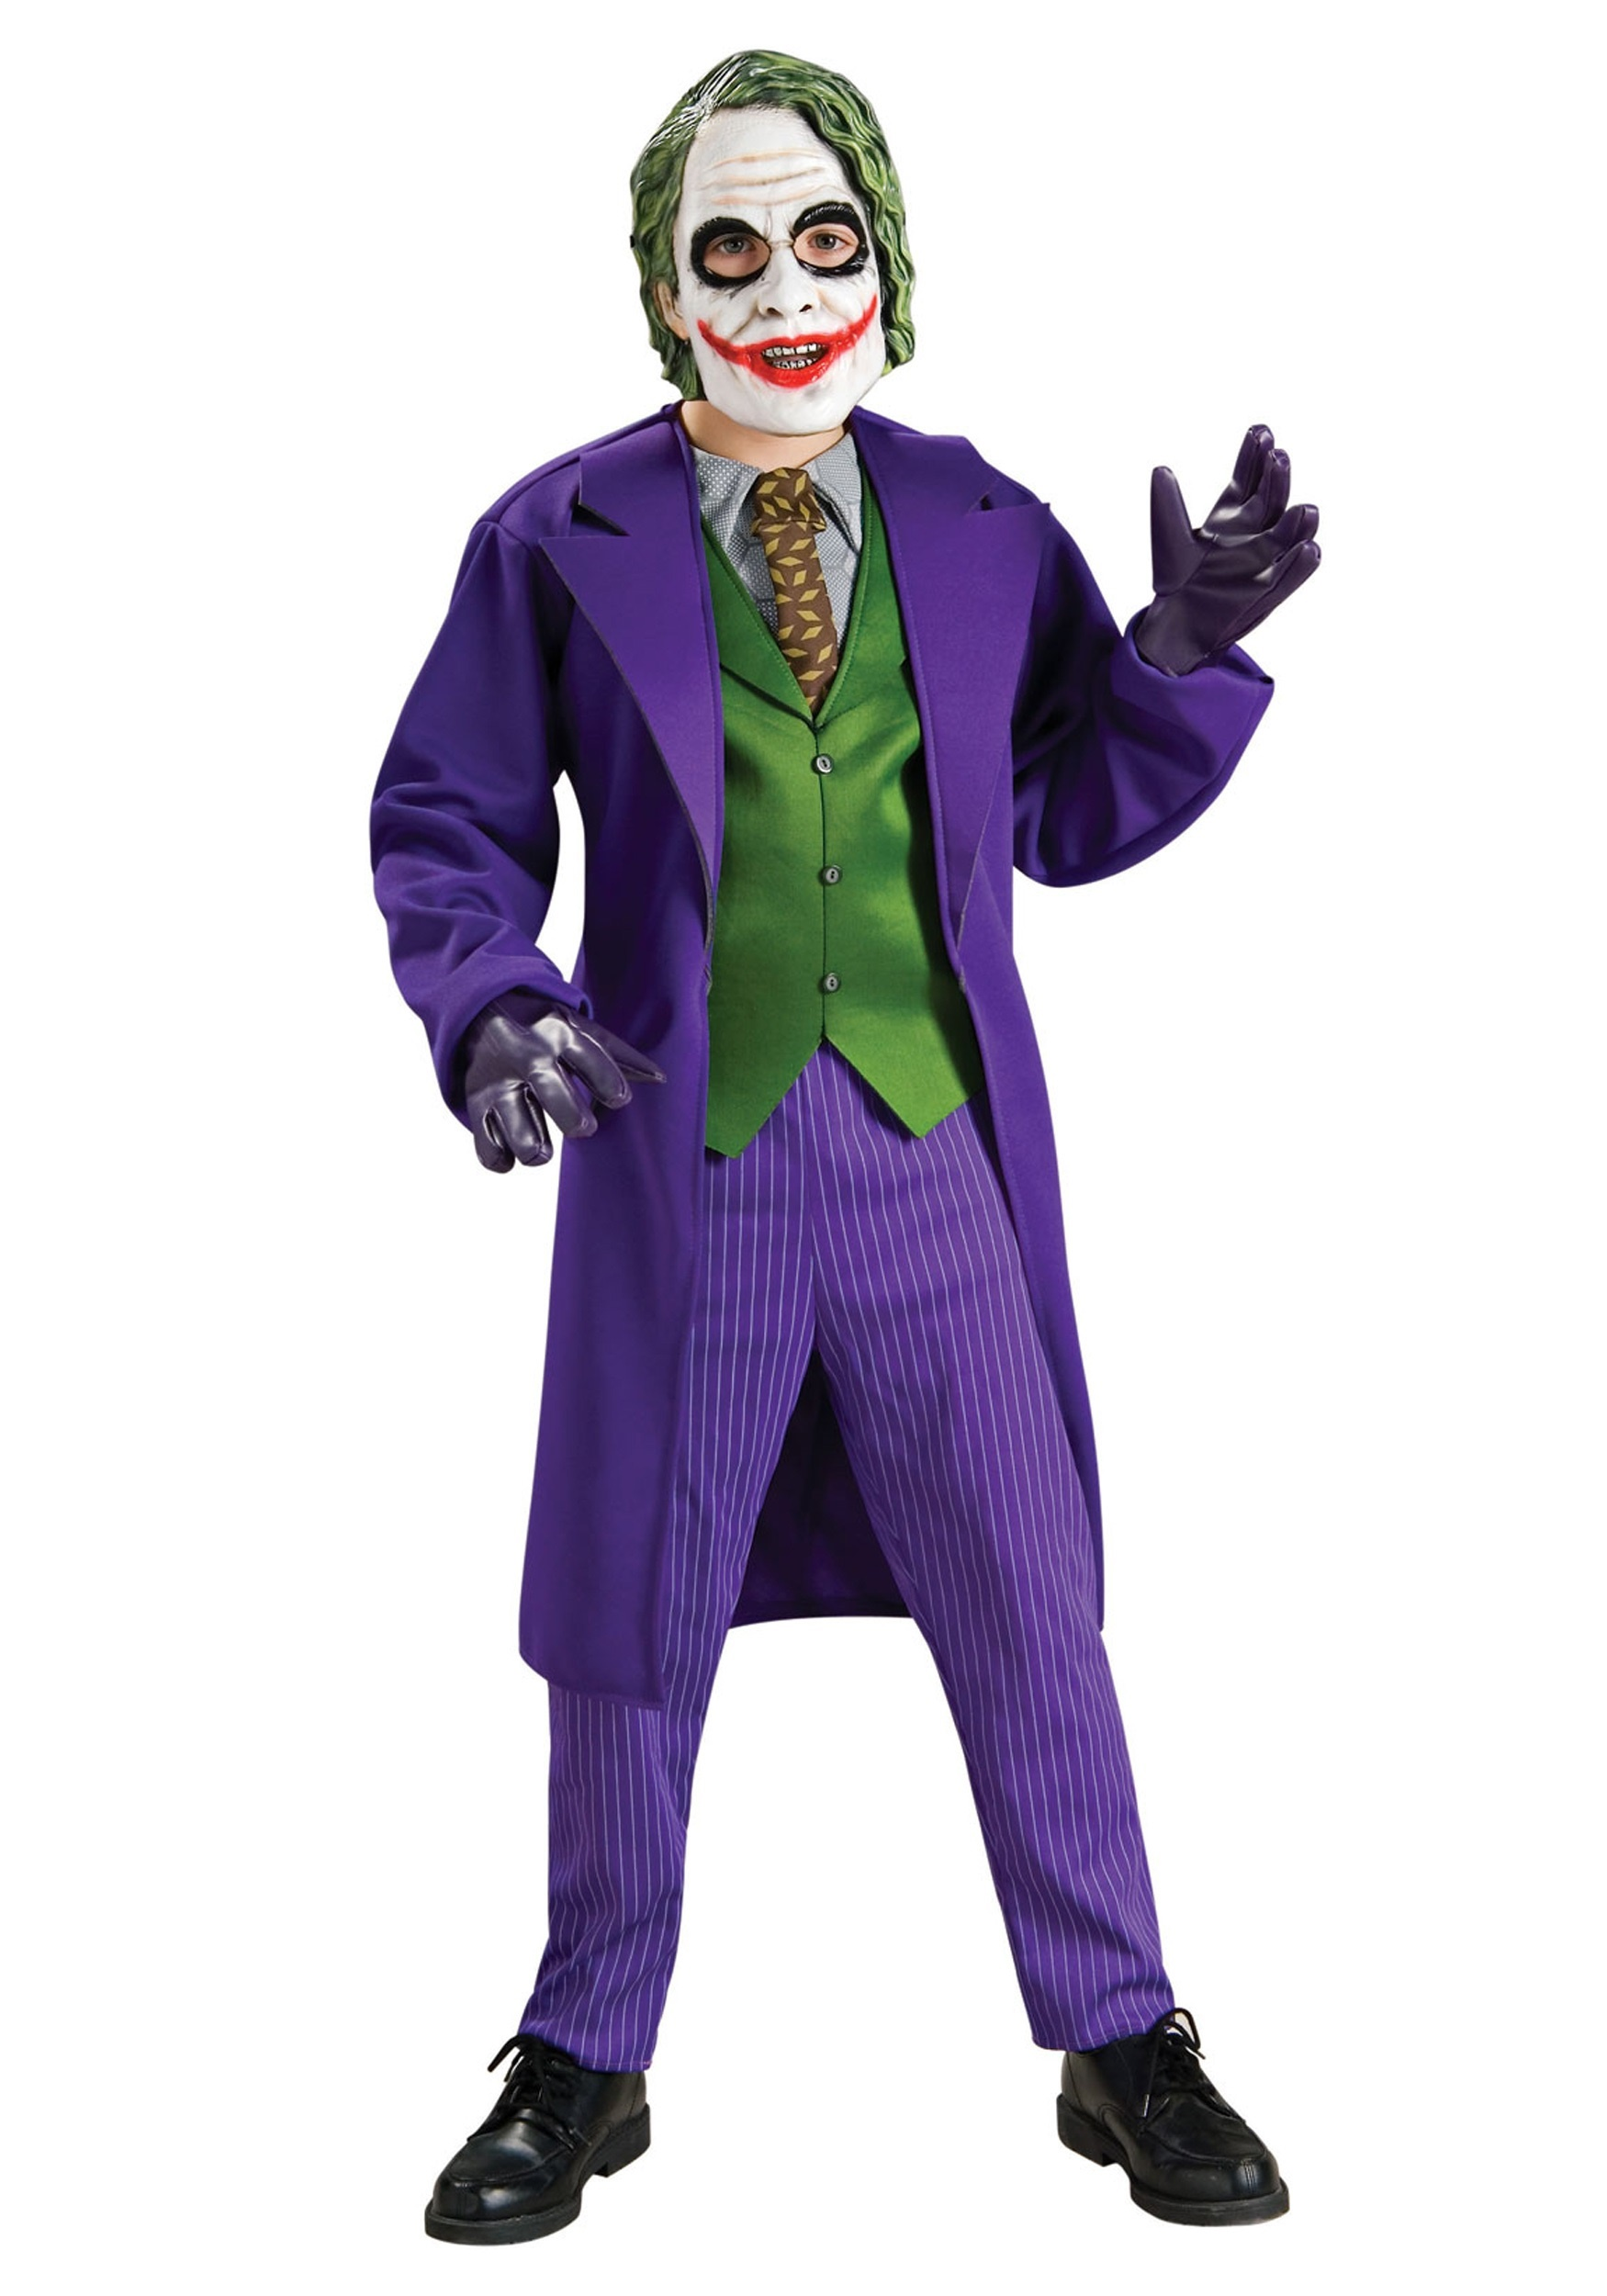 Deluxe Child Joker Costume | Joker Halloween Costume